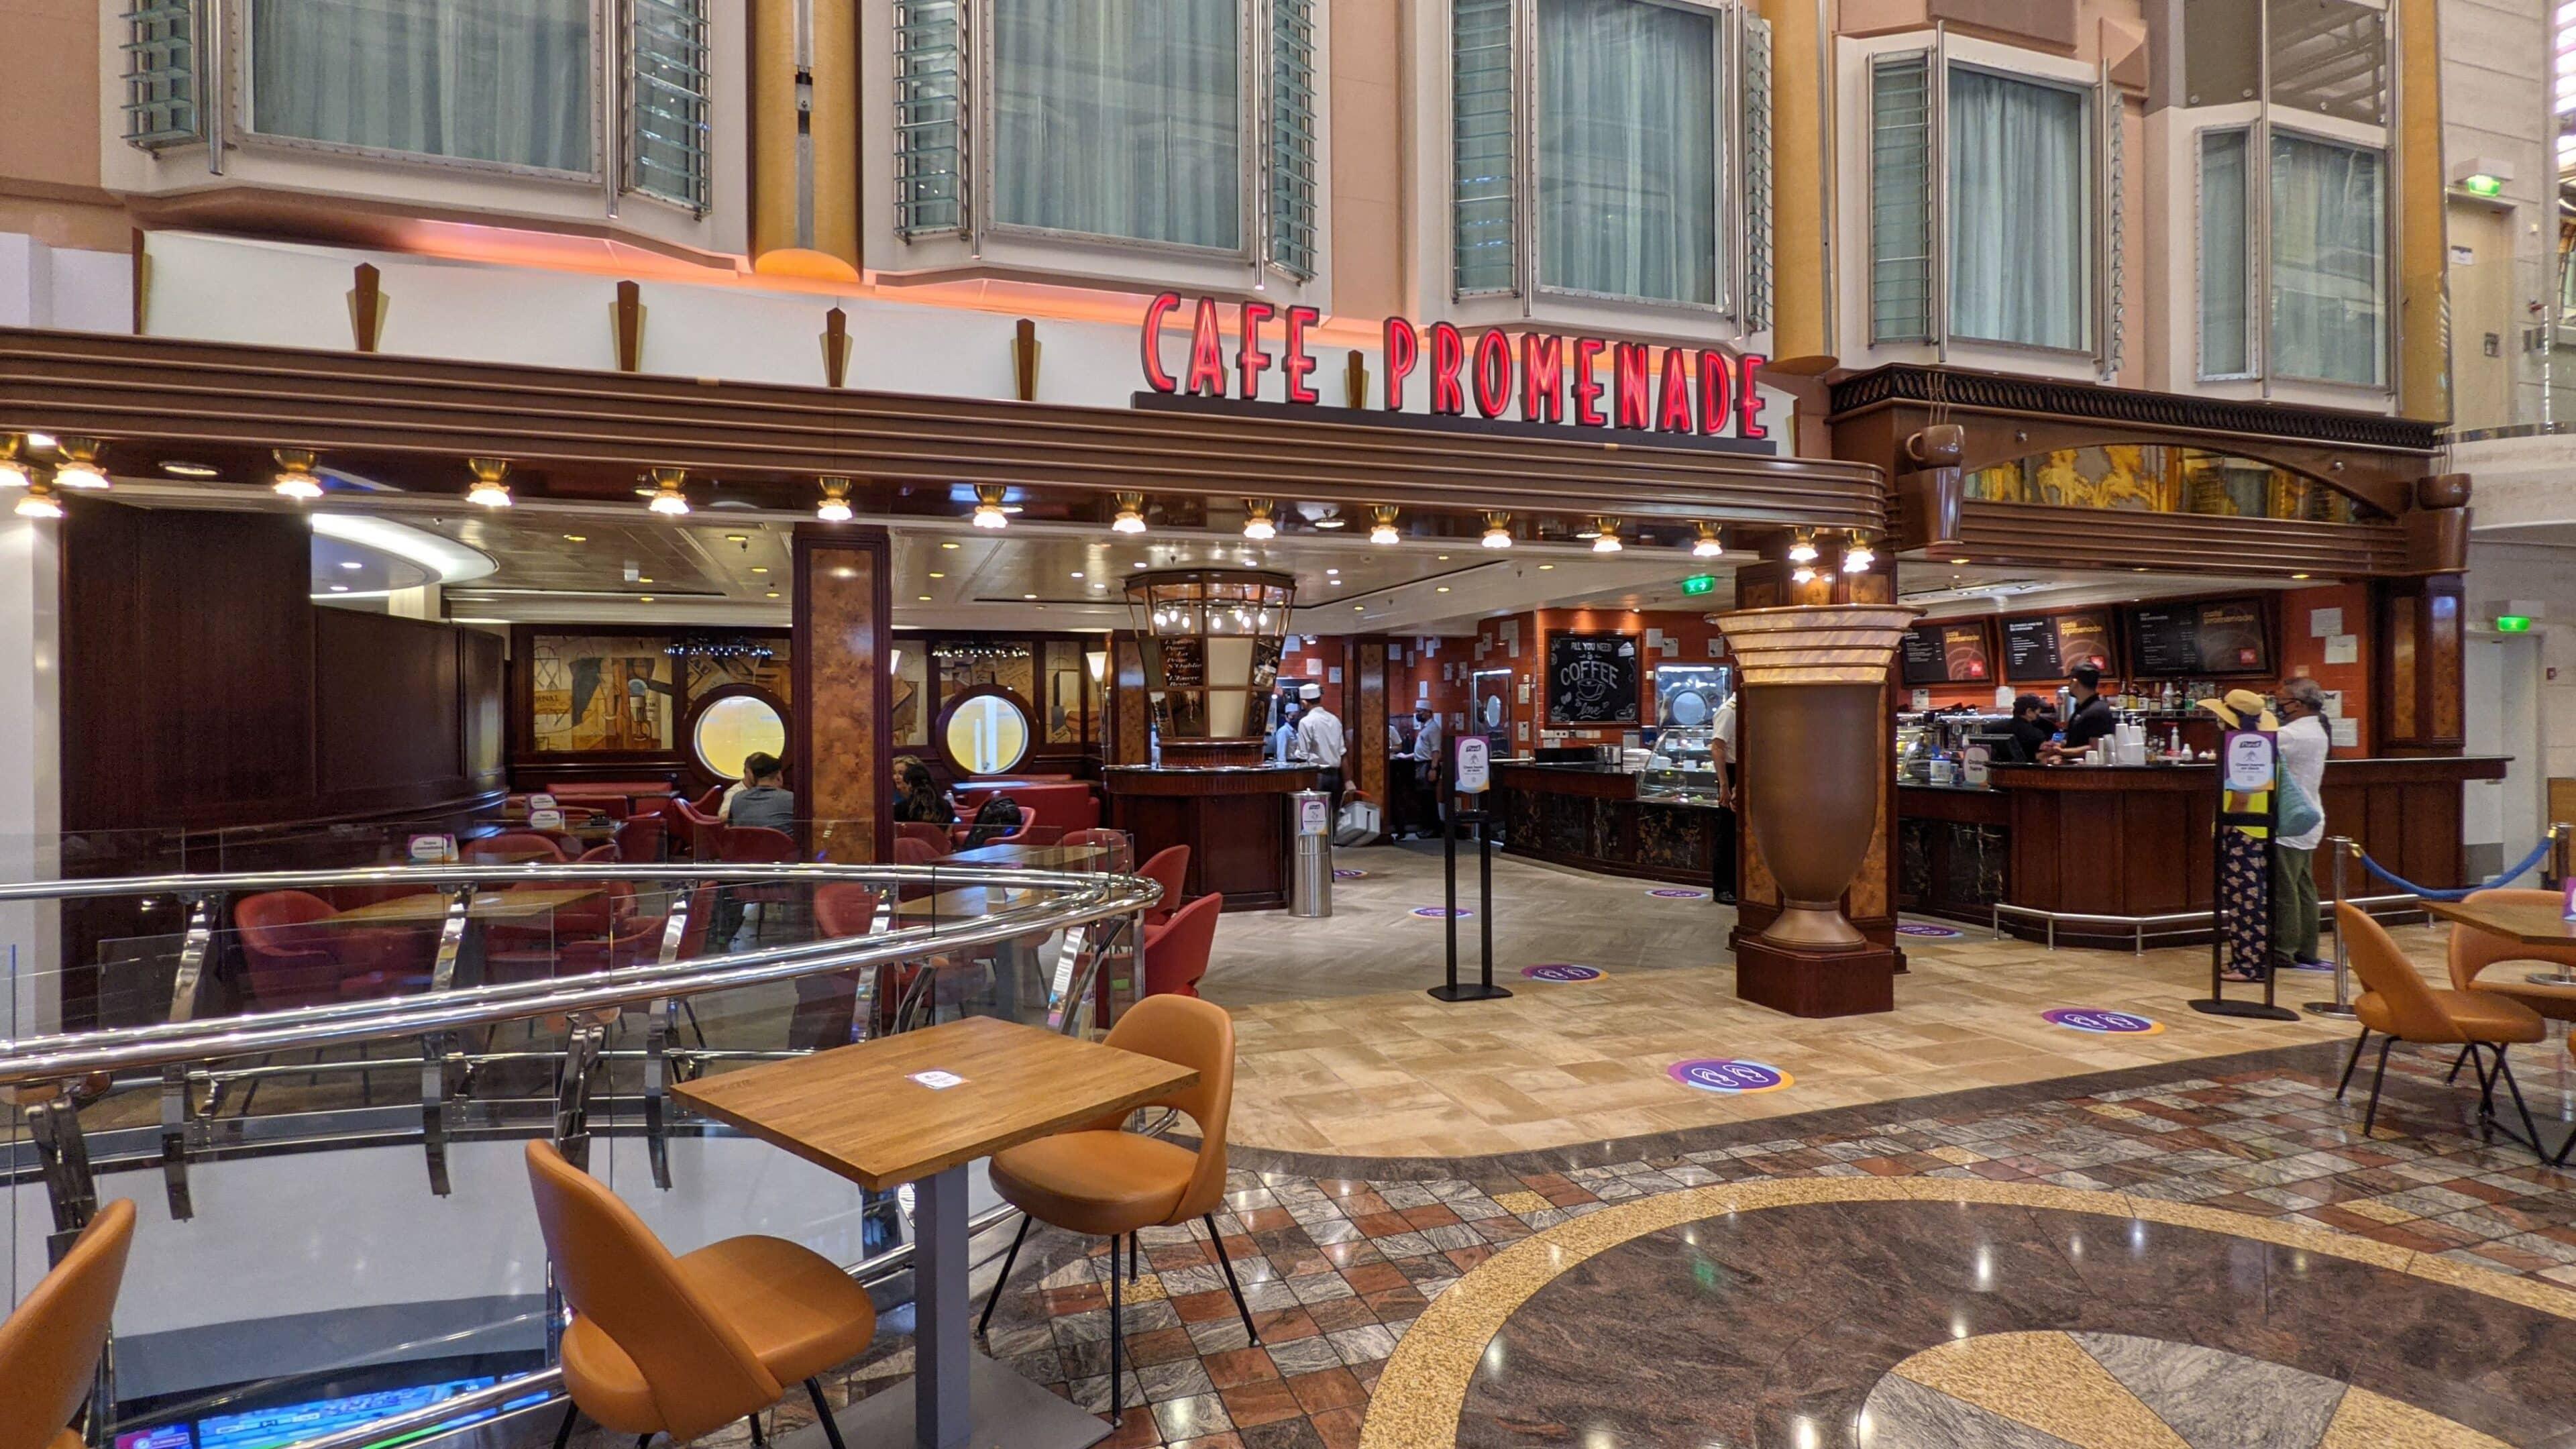 Cafe Promenade